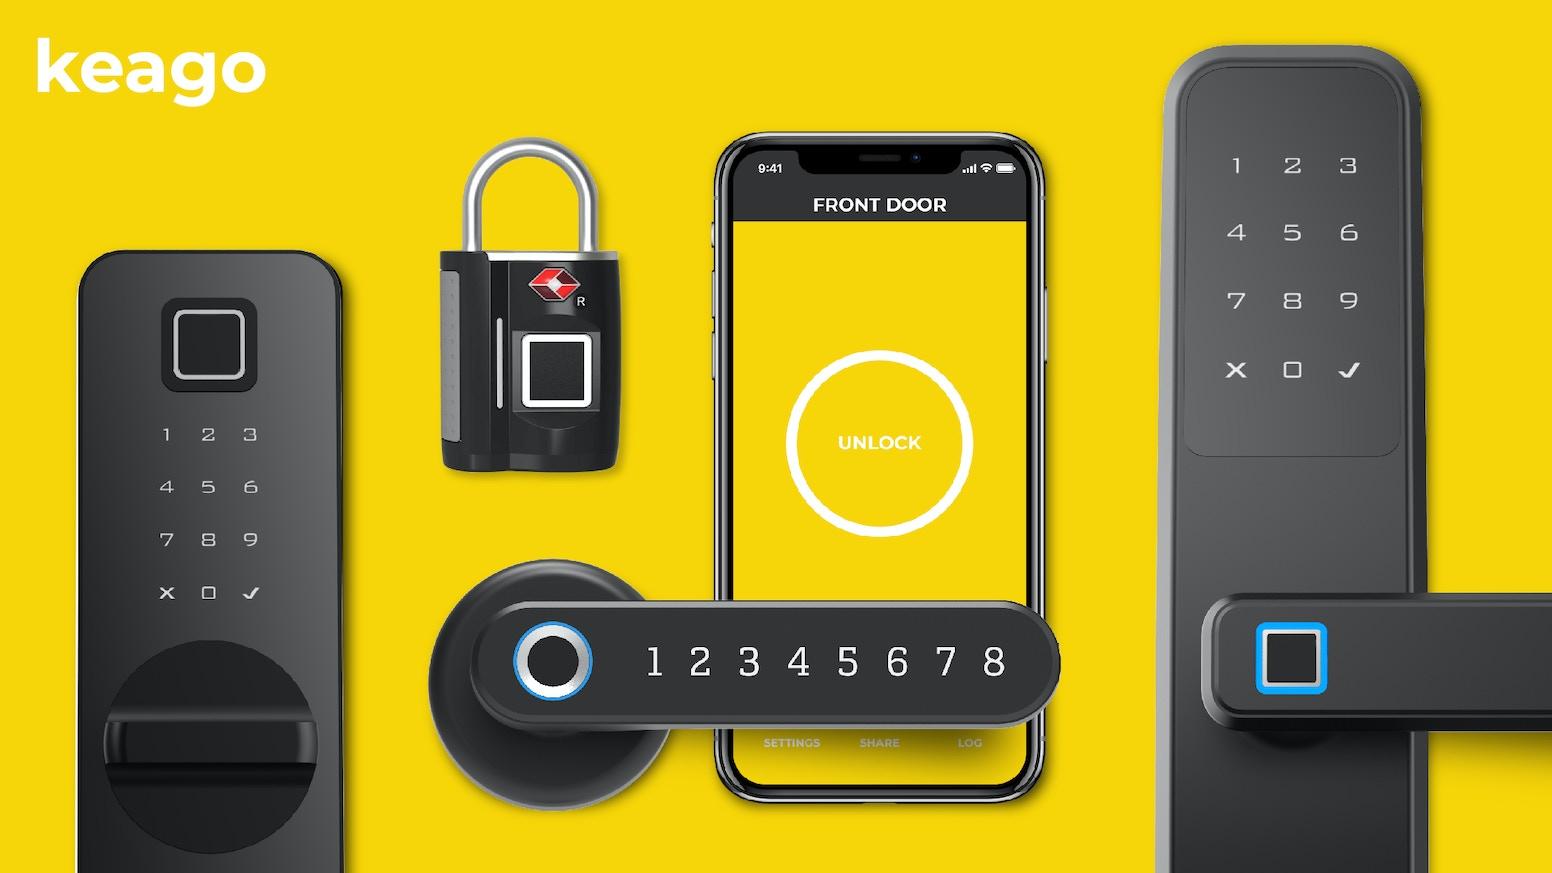 Keago: A Smartlock Without Limits! by Keago » Yes, we're